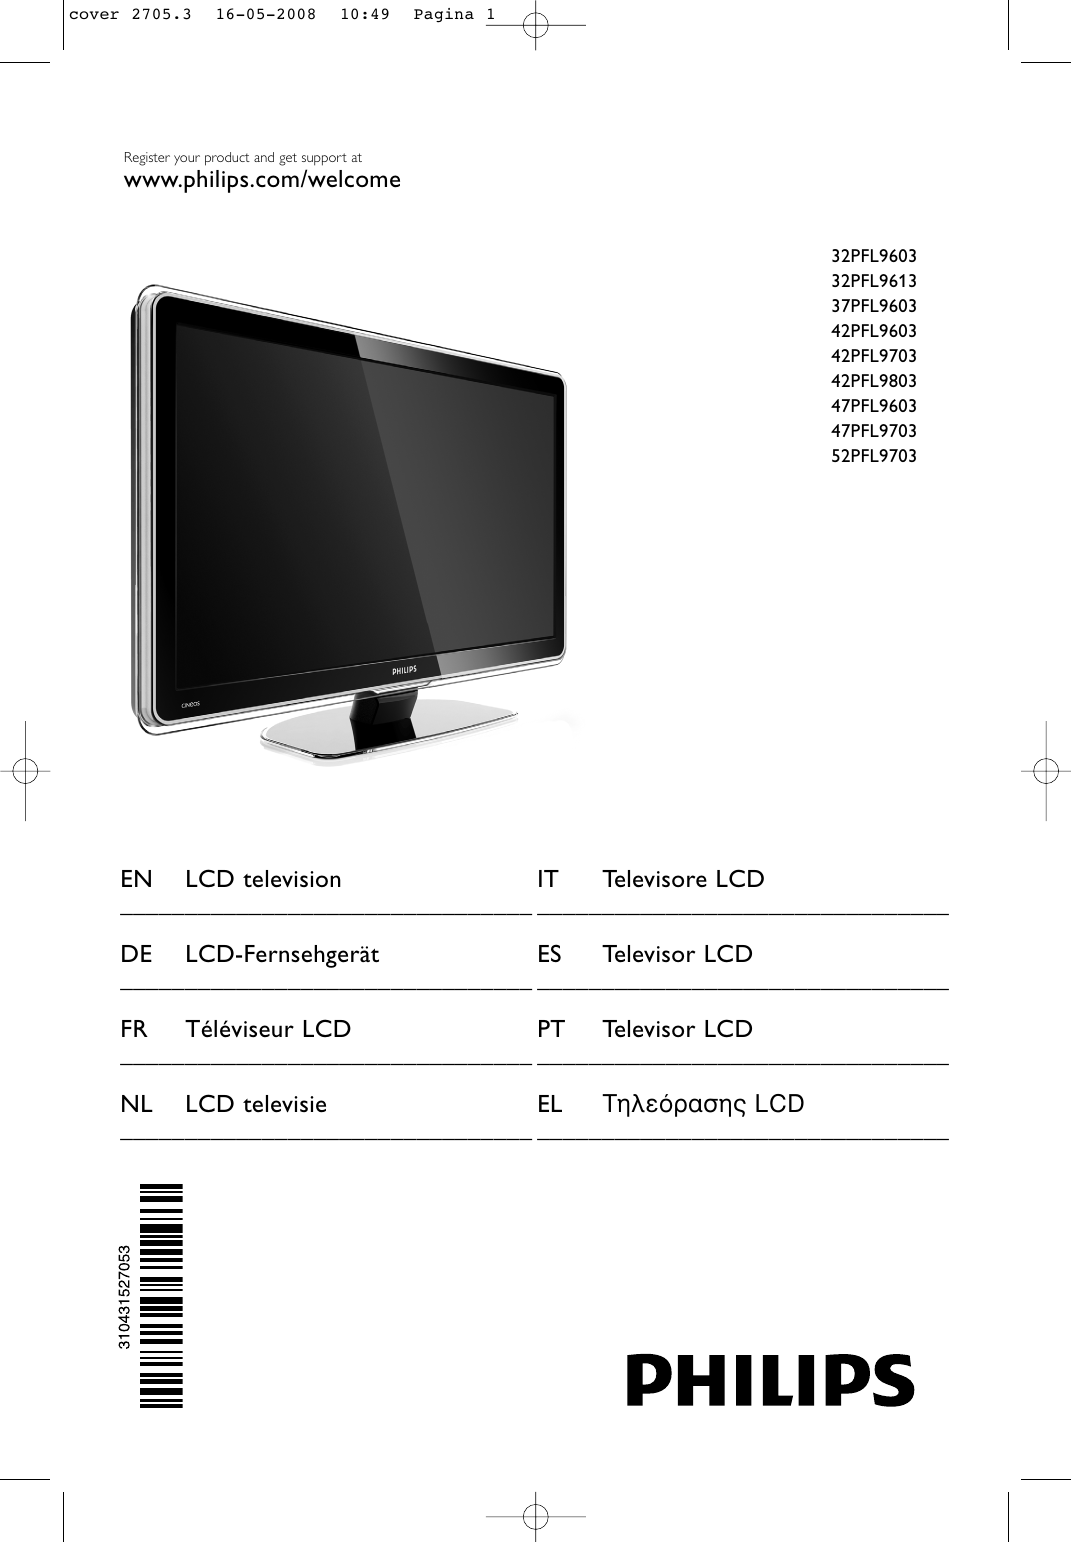 c0e4fb063 Philips 42PFL9803H/10 2705.3 PT User Manual Bedienungsanleitung 42pfl9803h  10 Dfu Por